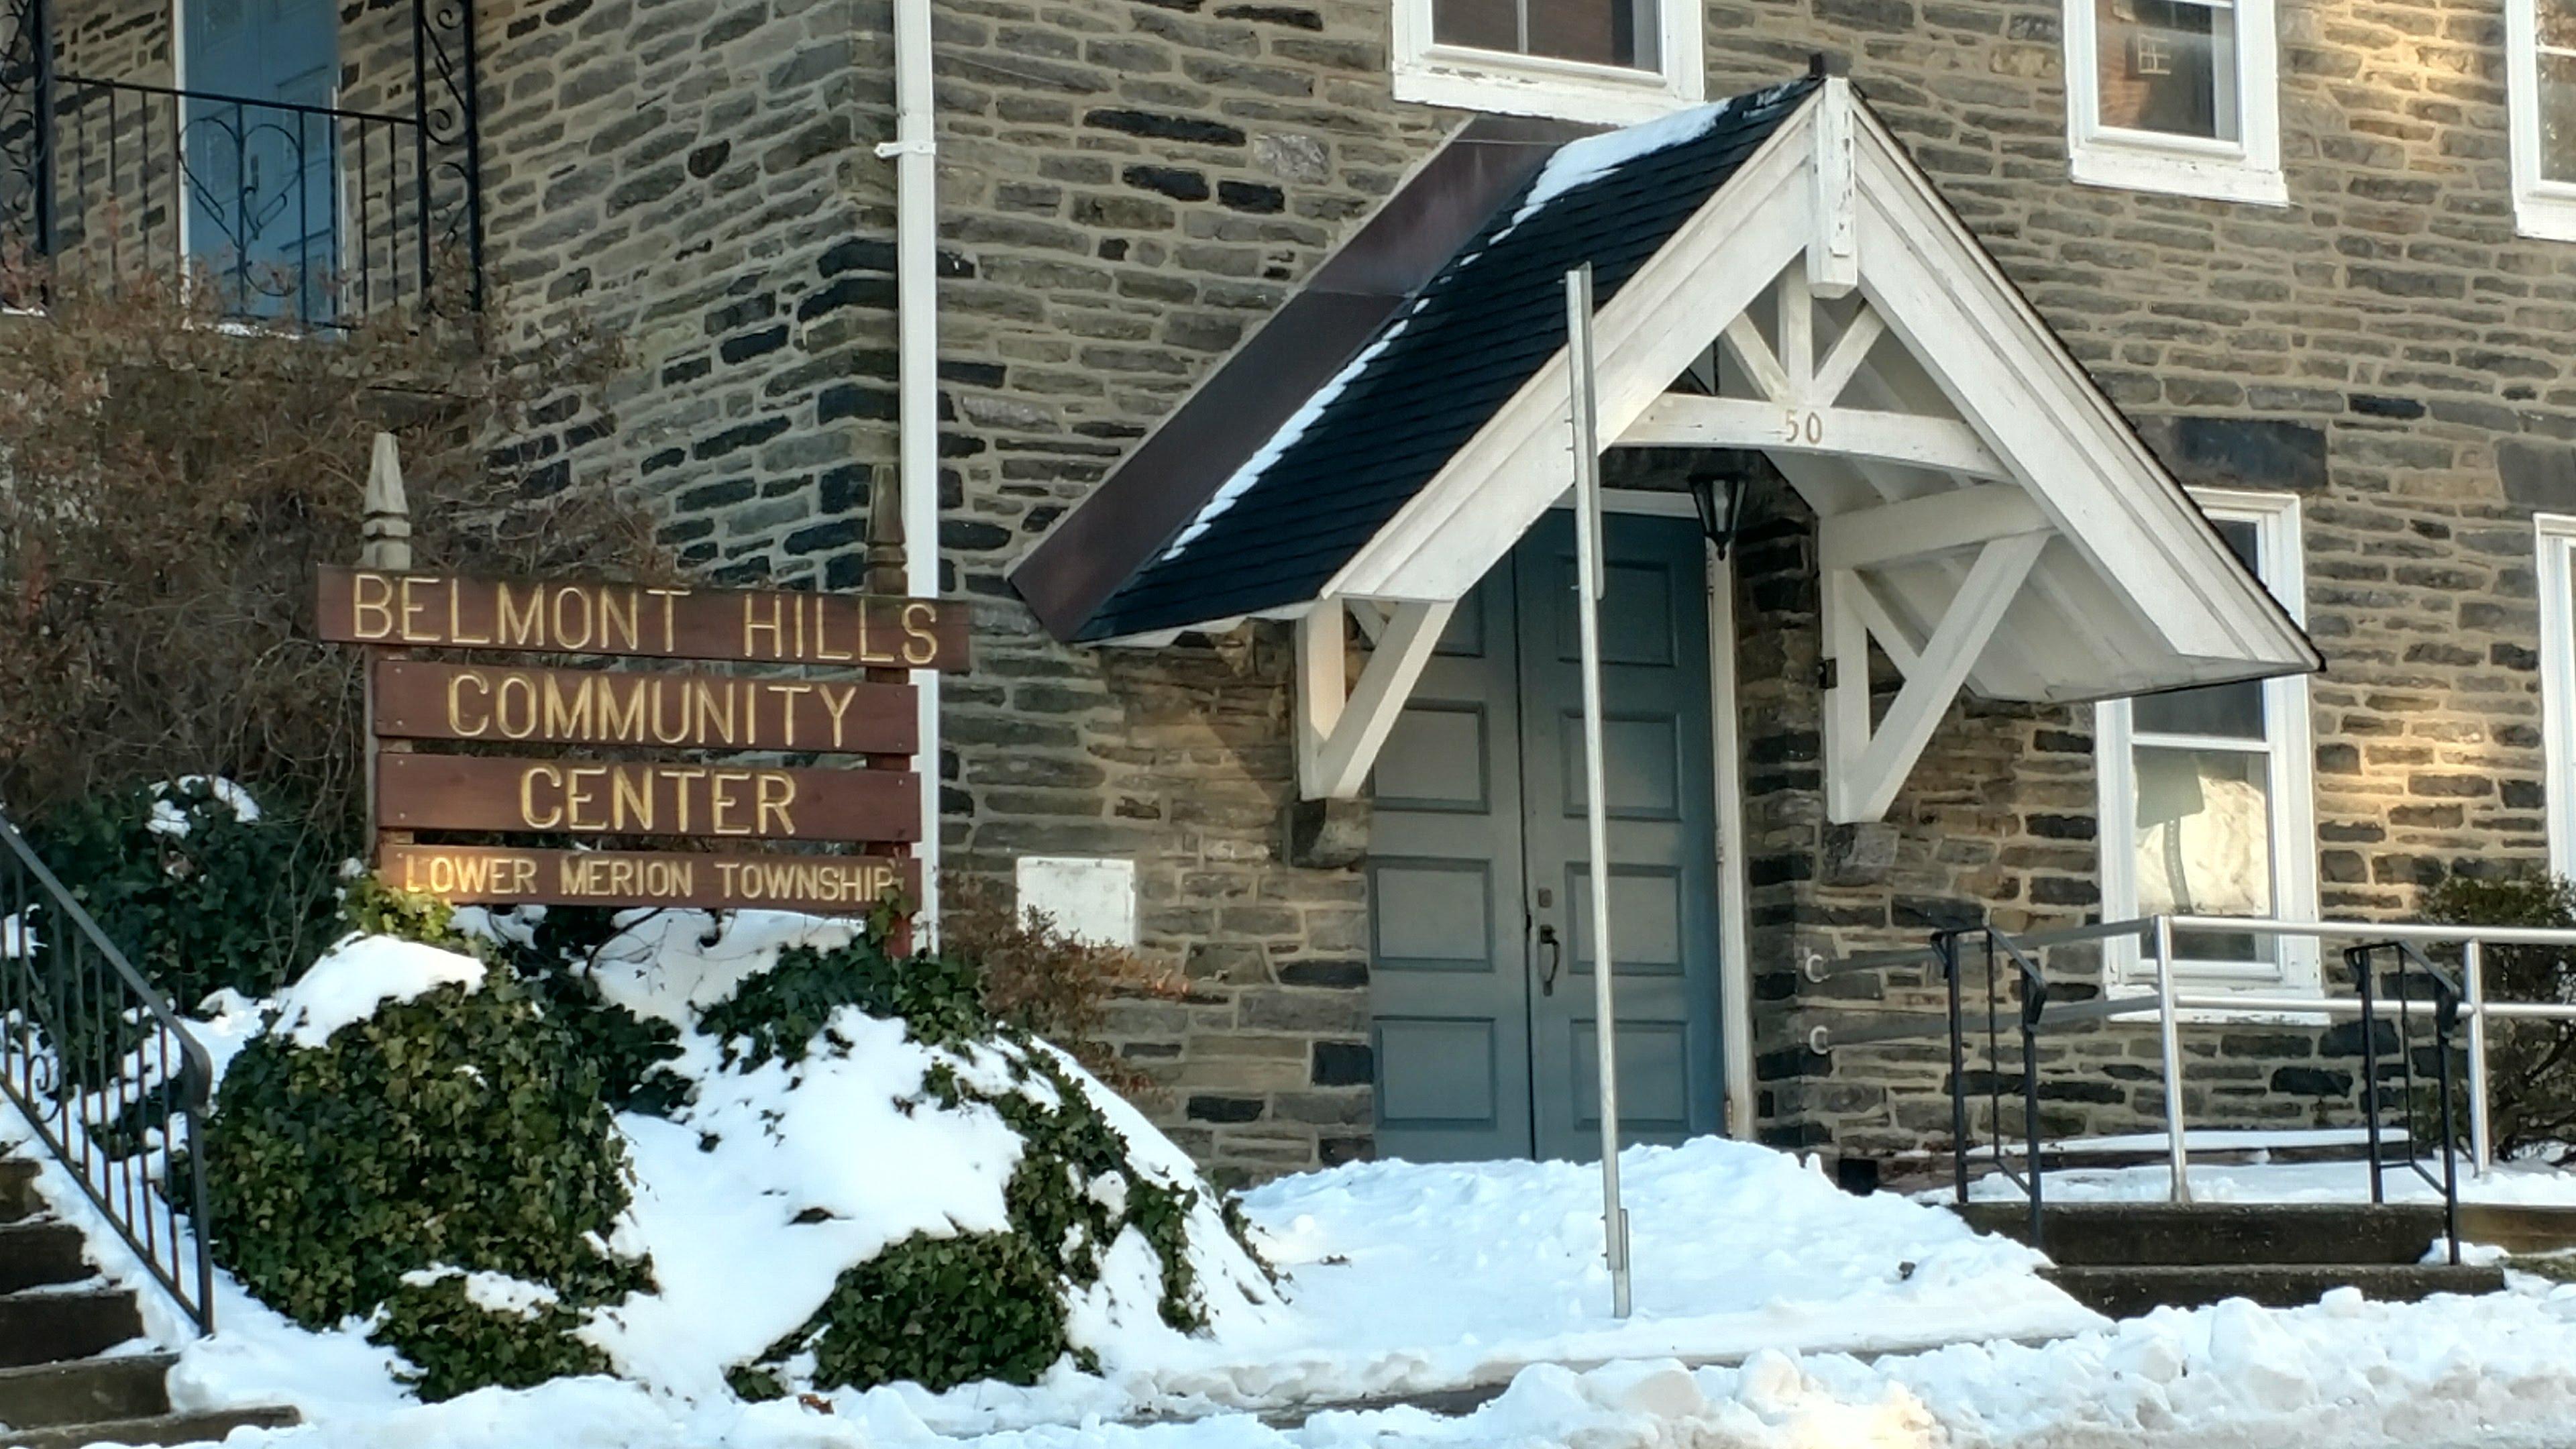 Belmont Hills Community Center Hall Rentals In Bala Cynwyd Pa